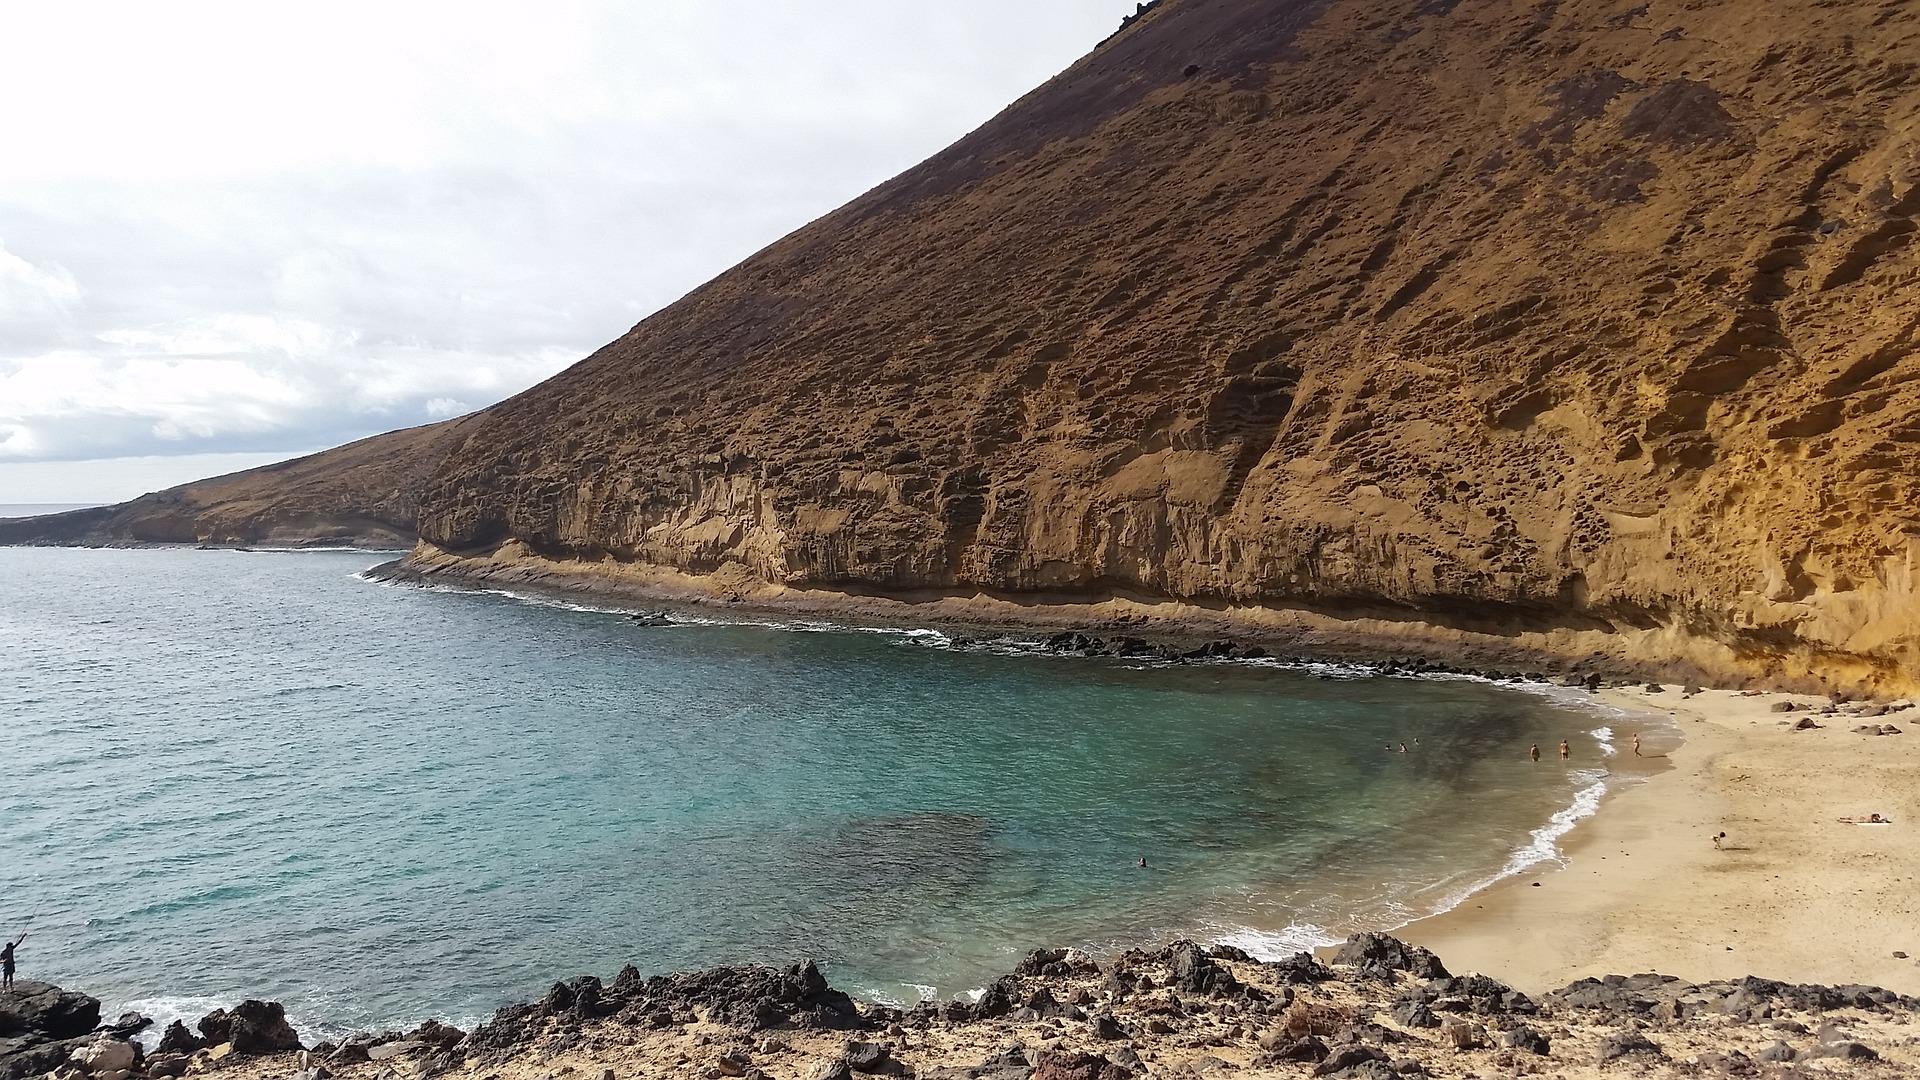 Lanzerote abgelgener Strand Playa Las cucharas